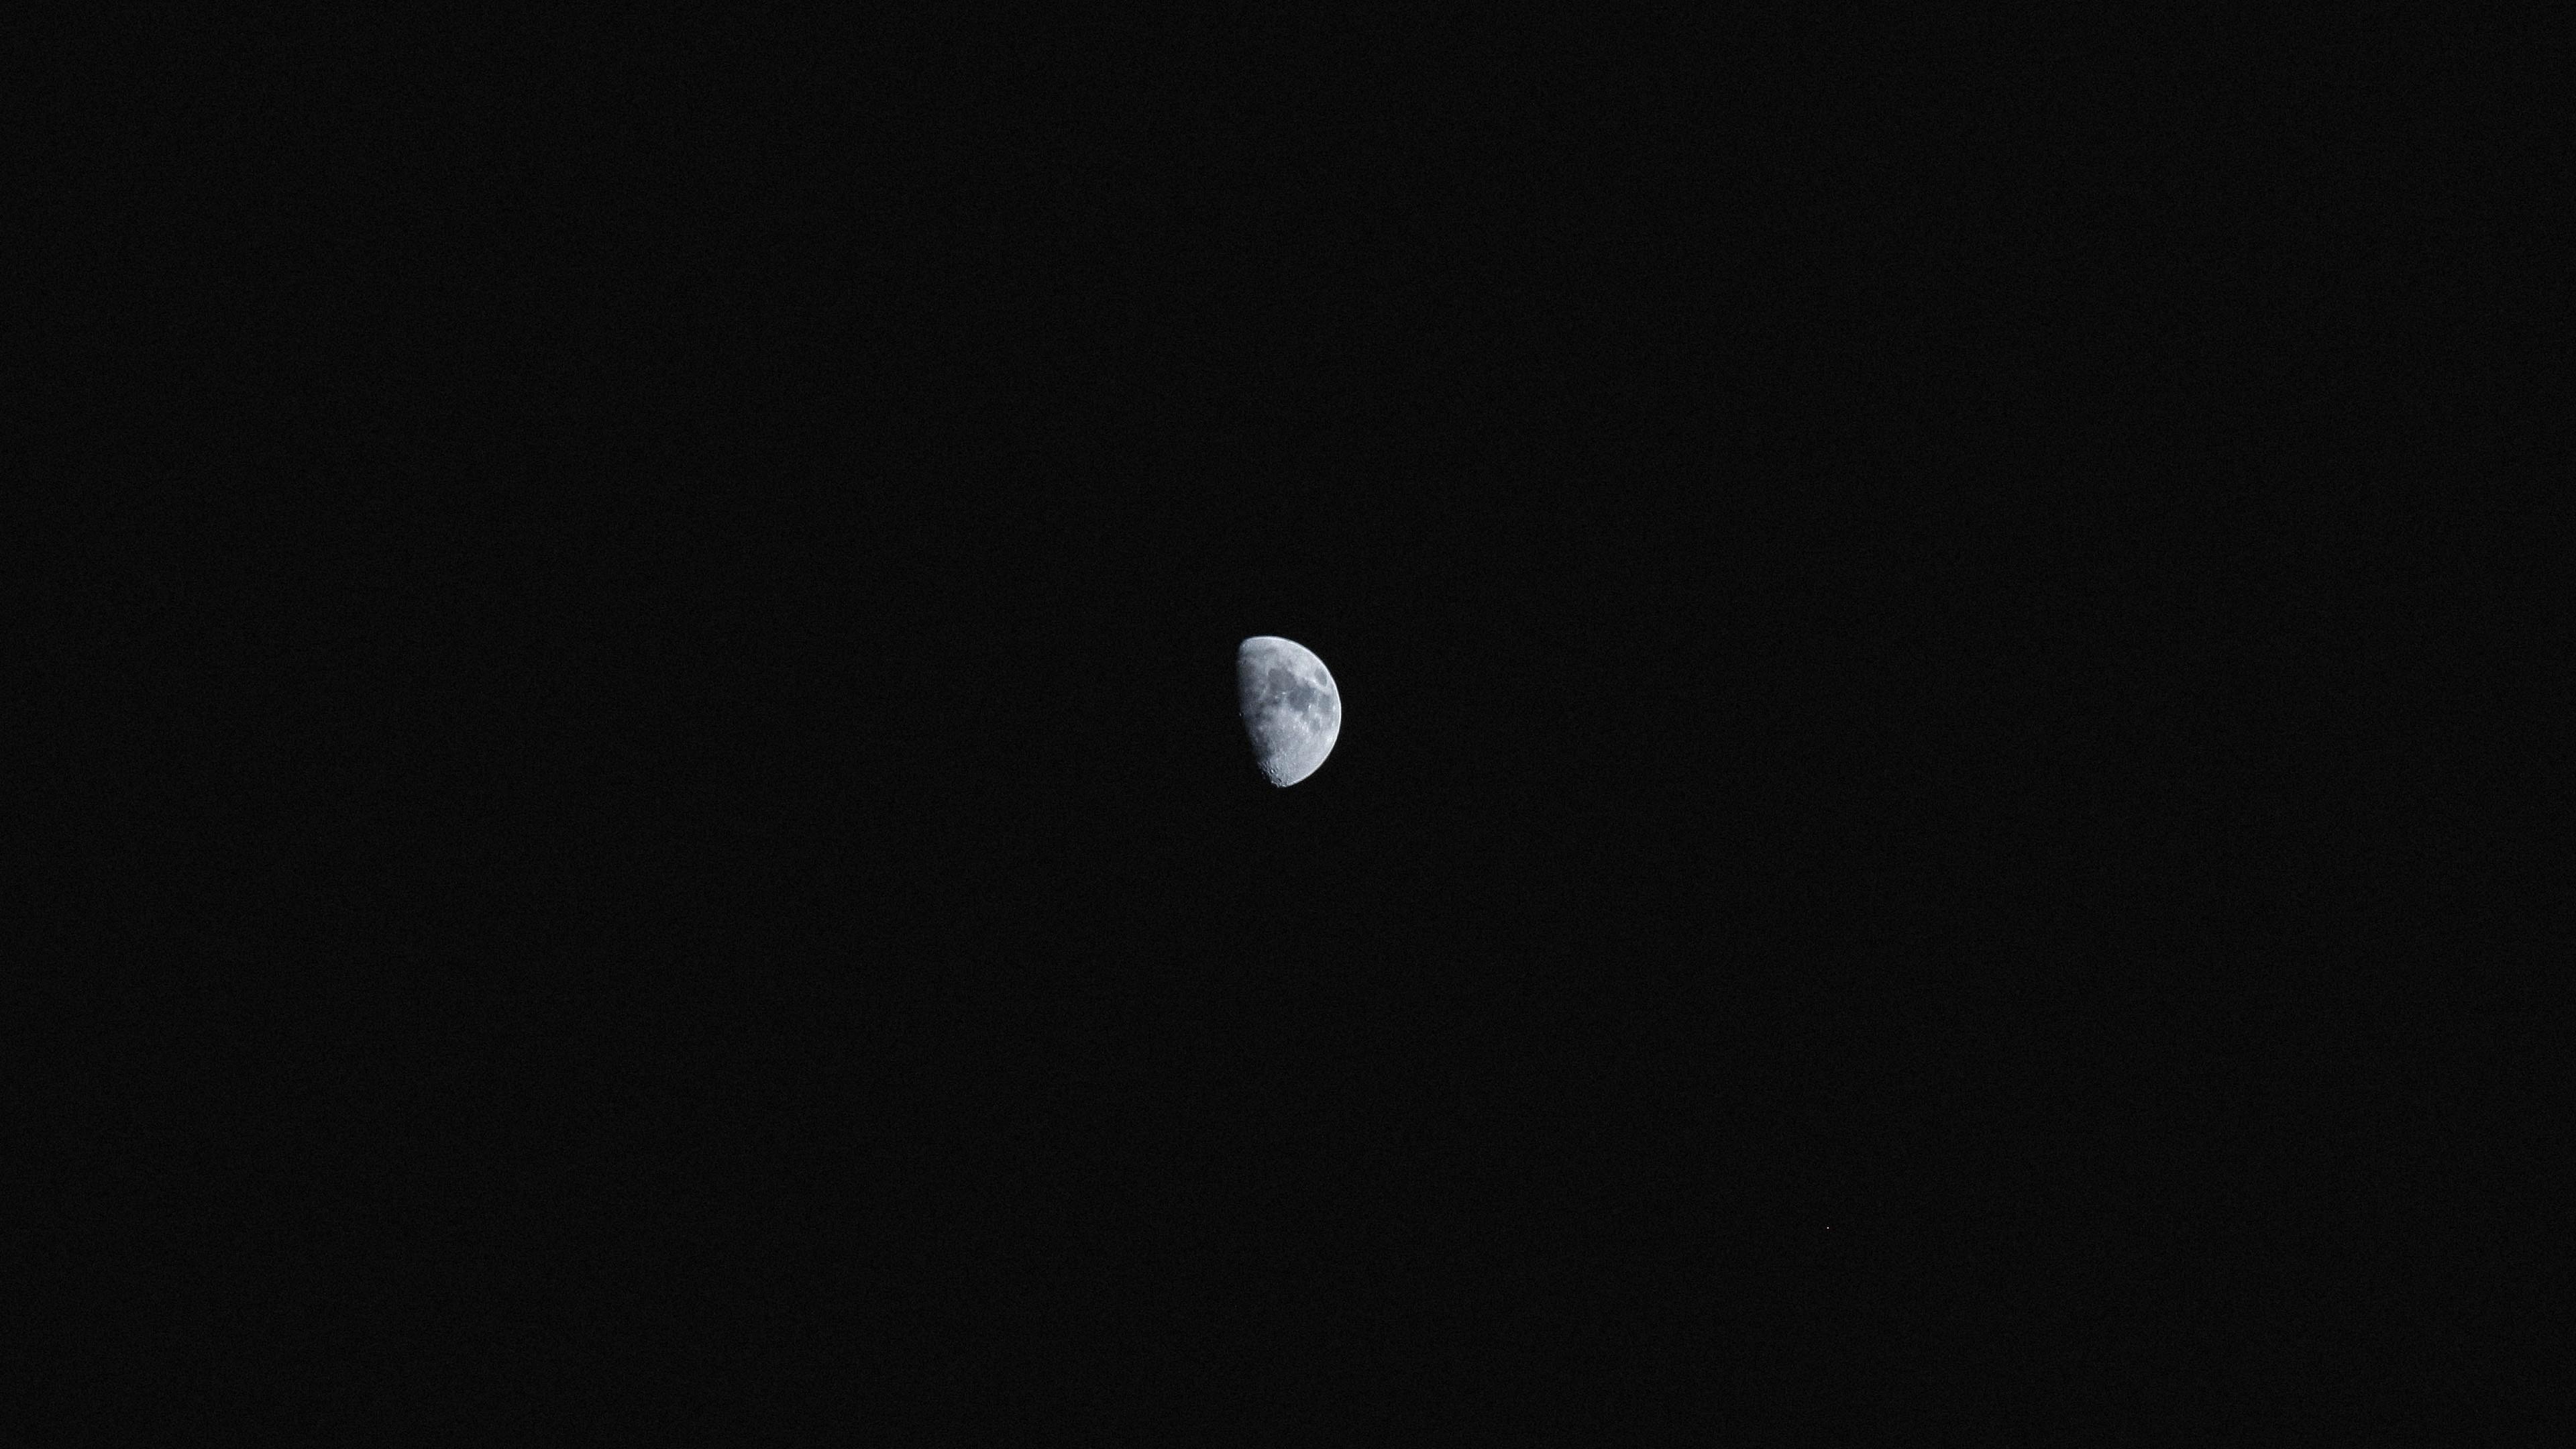 4k Moon Full Moon Sky Wallpaper 3840x2160